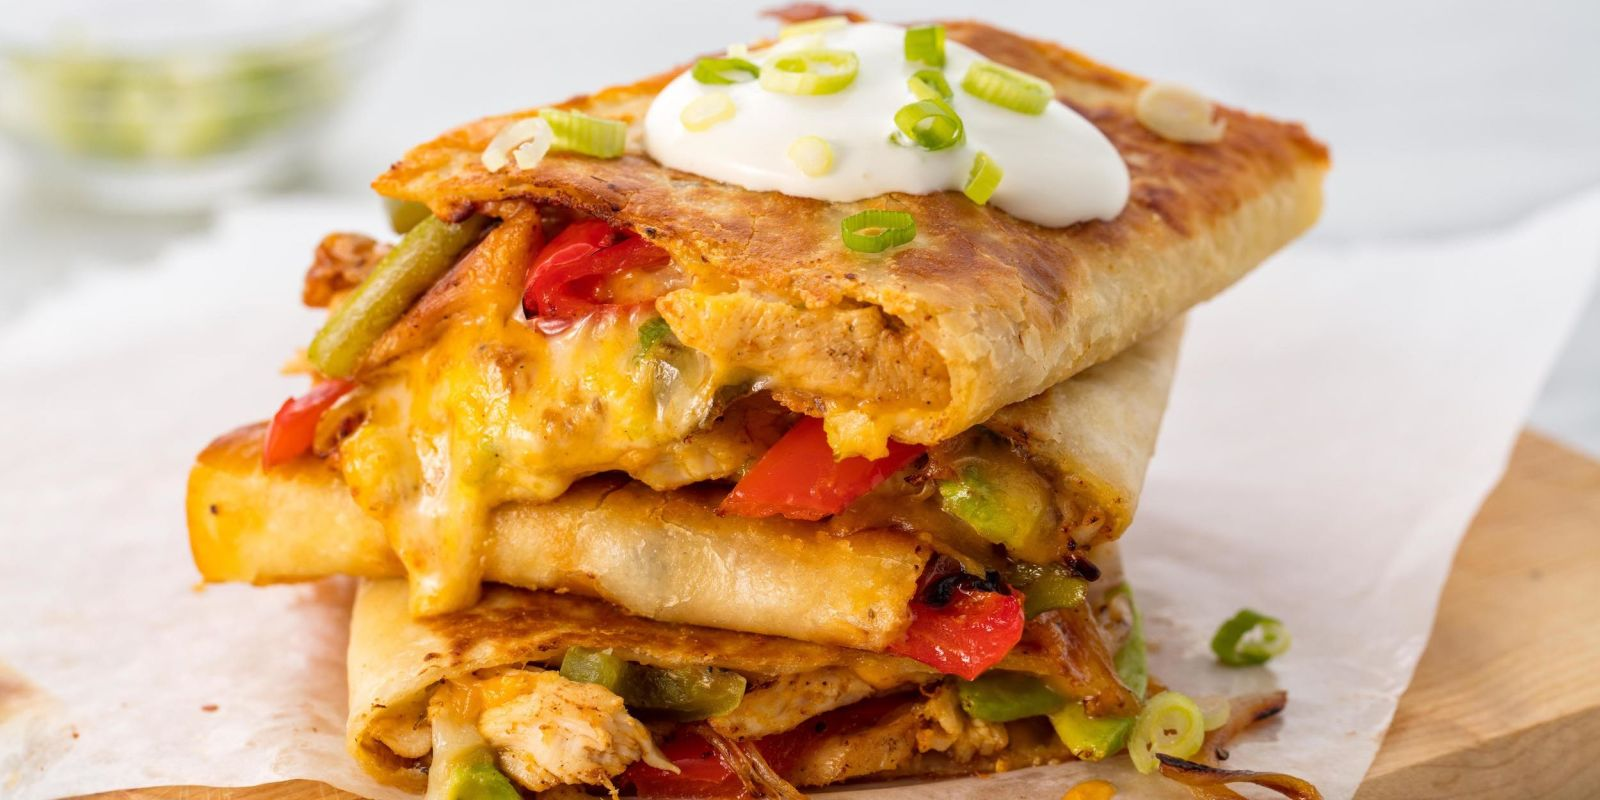 Easy Chicken Quesadilla Recipe  How to Make Best Chicken Quesadillas